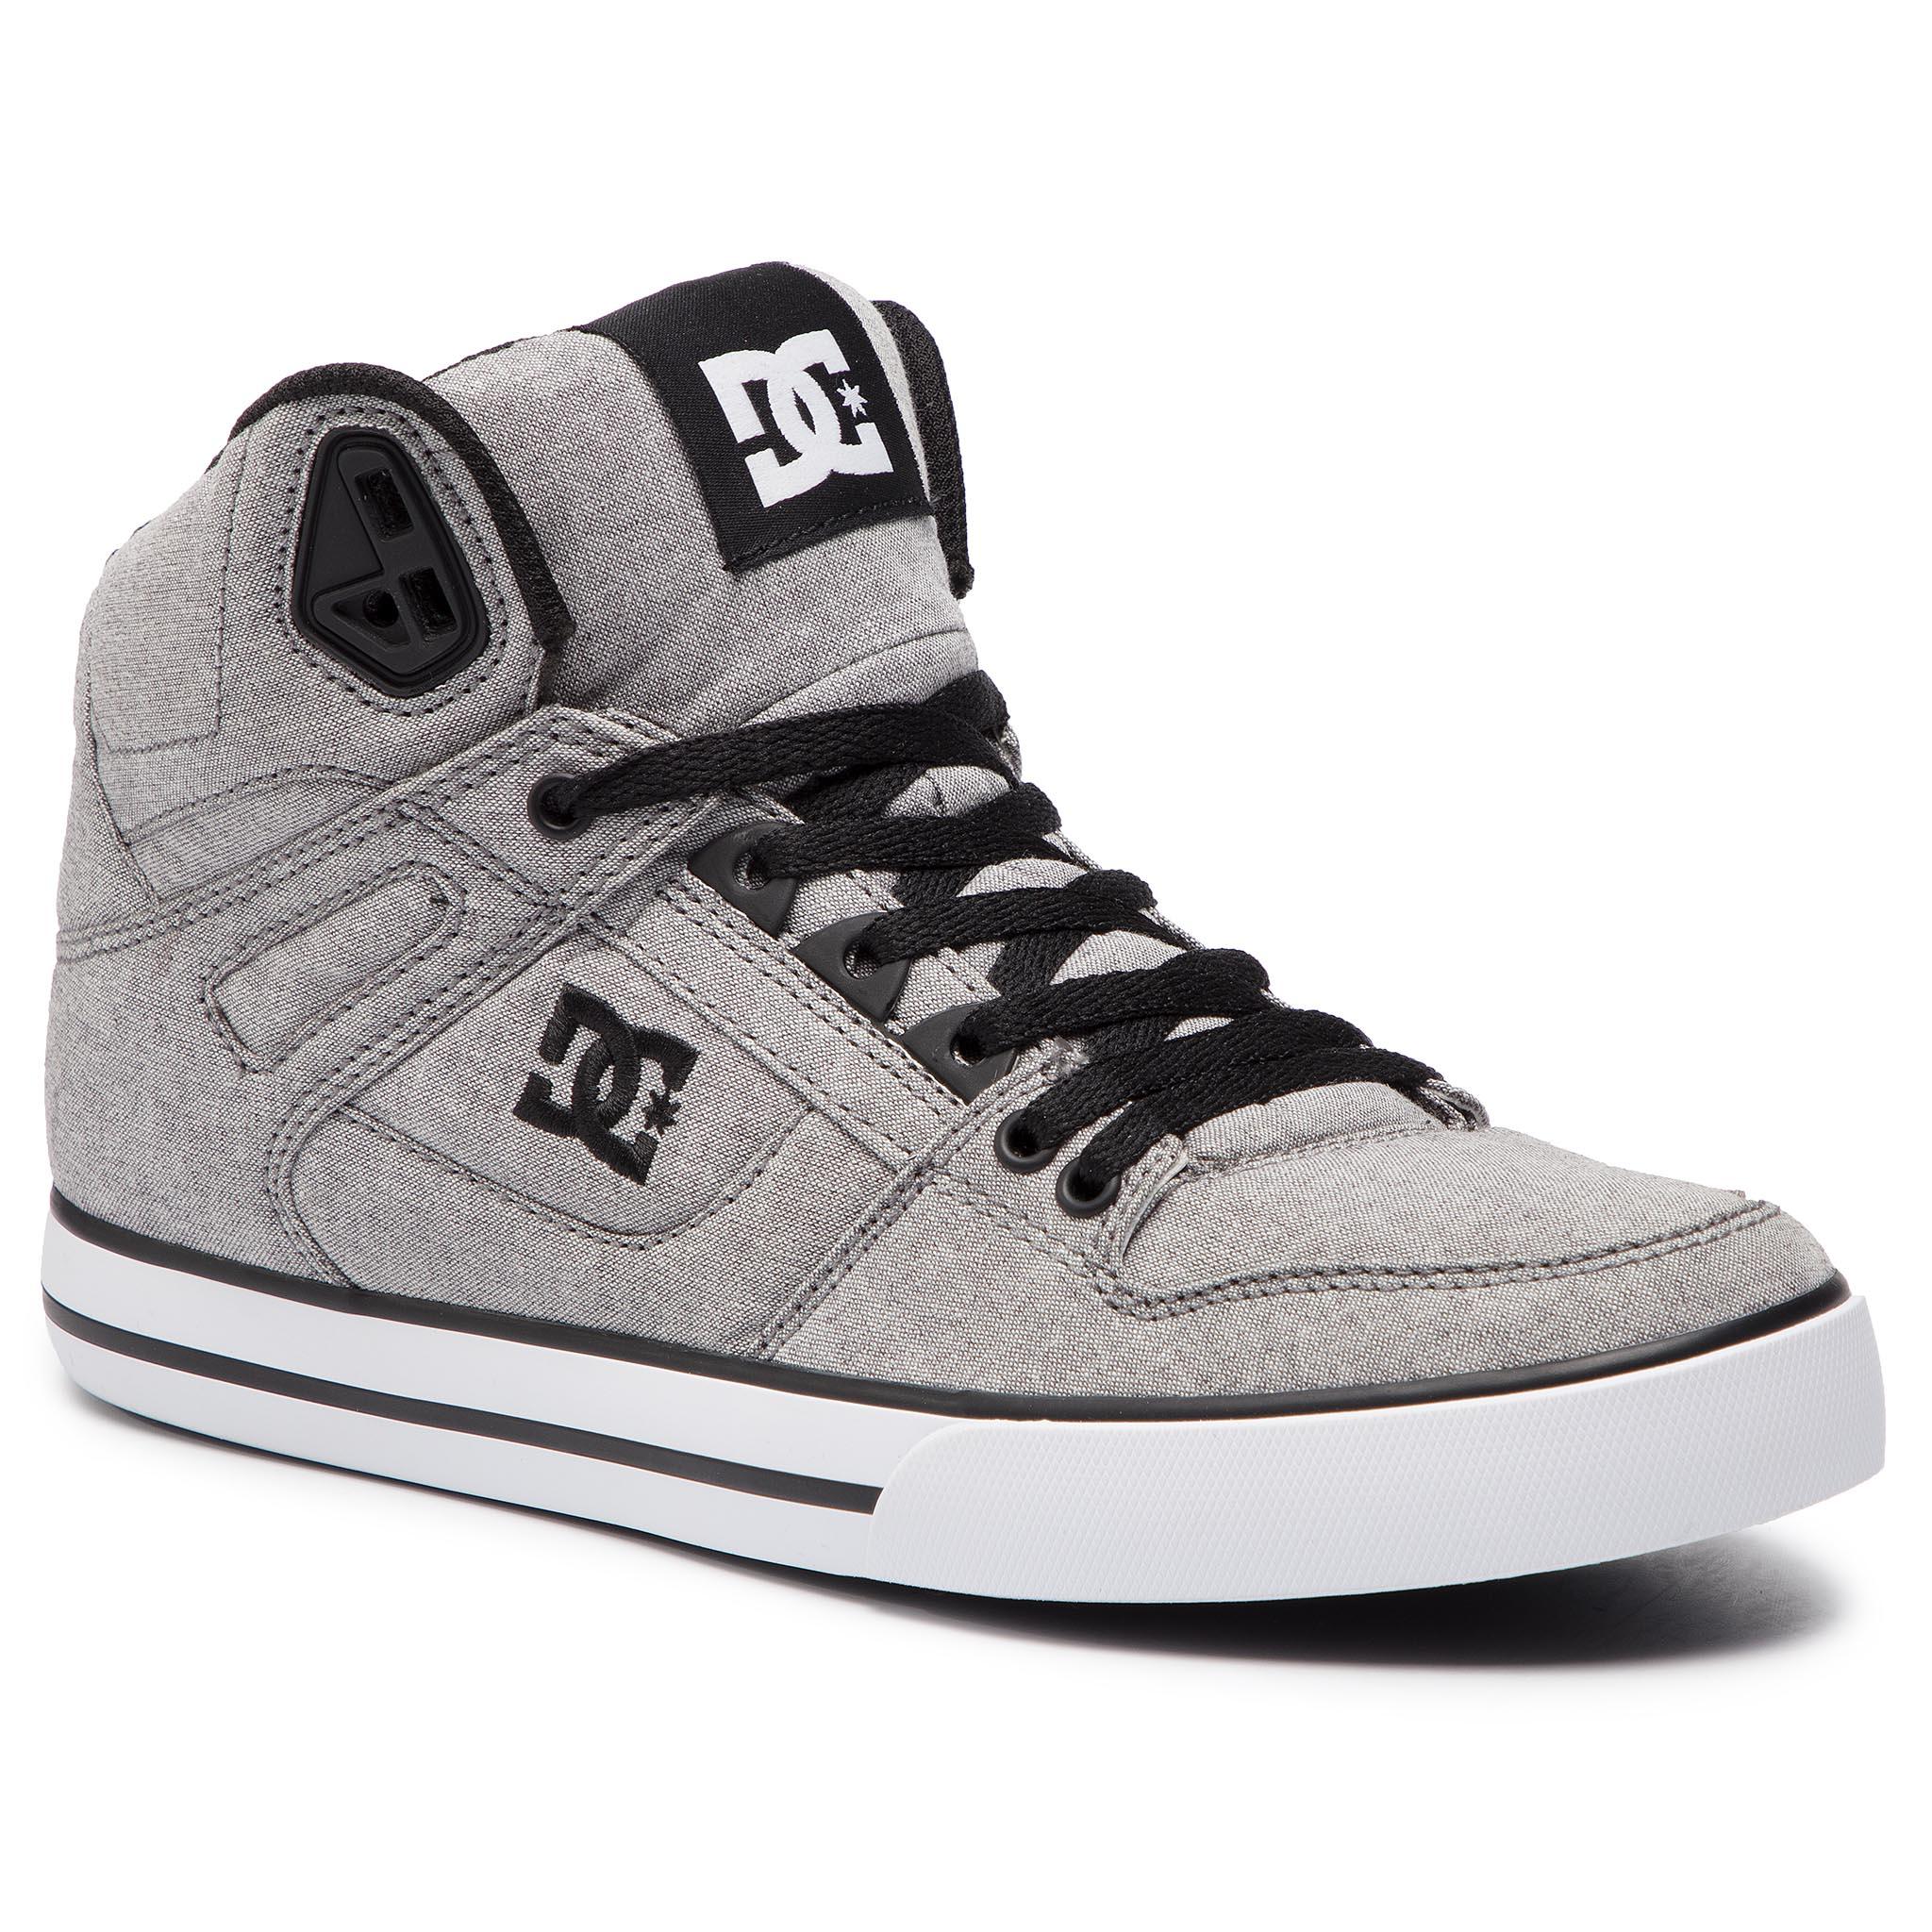 63ac04b62 Sneakersy DC - Pure High-Top Wc Tx Se ADYS400046 Grey (Gry) - Glami.sk